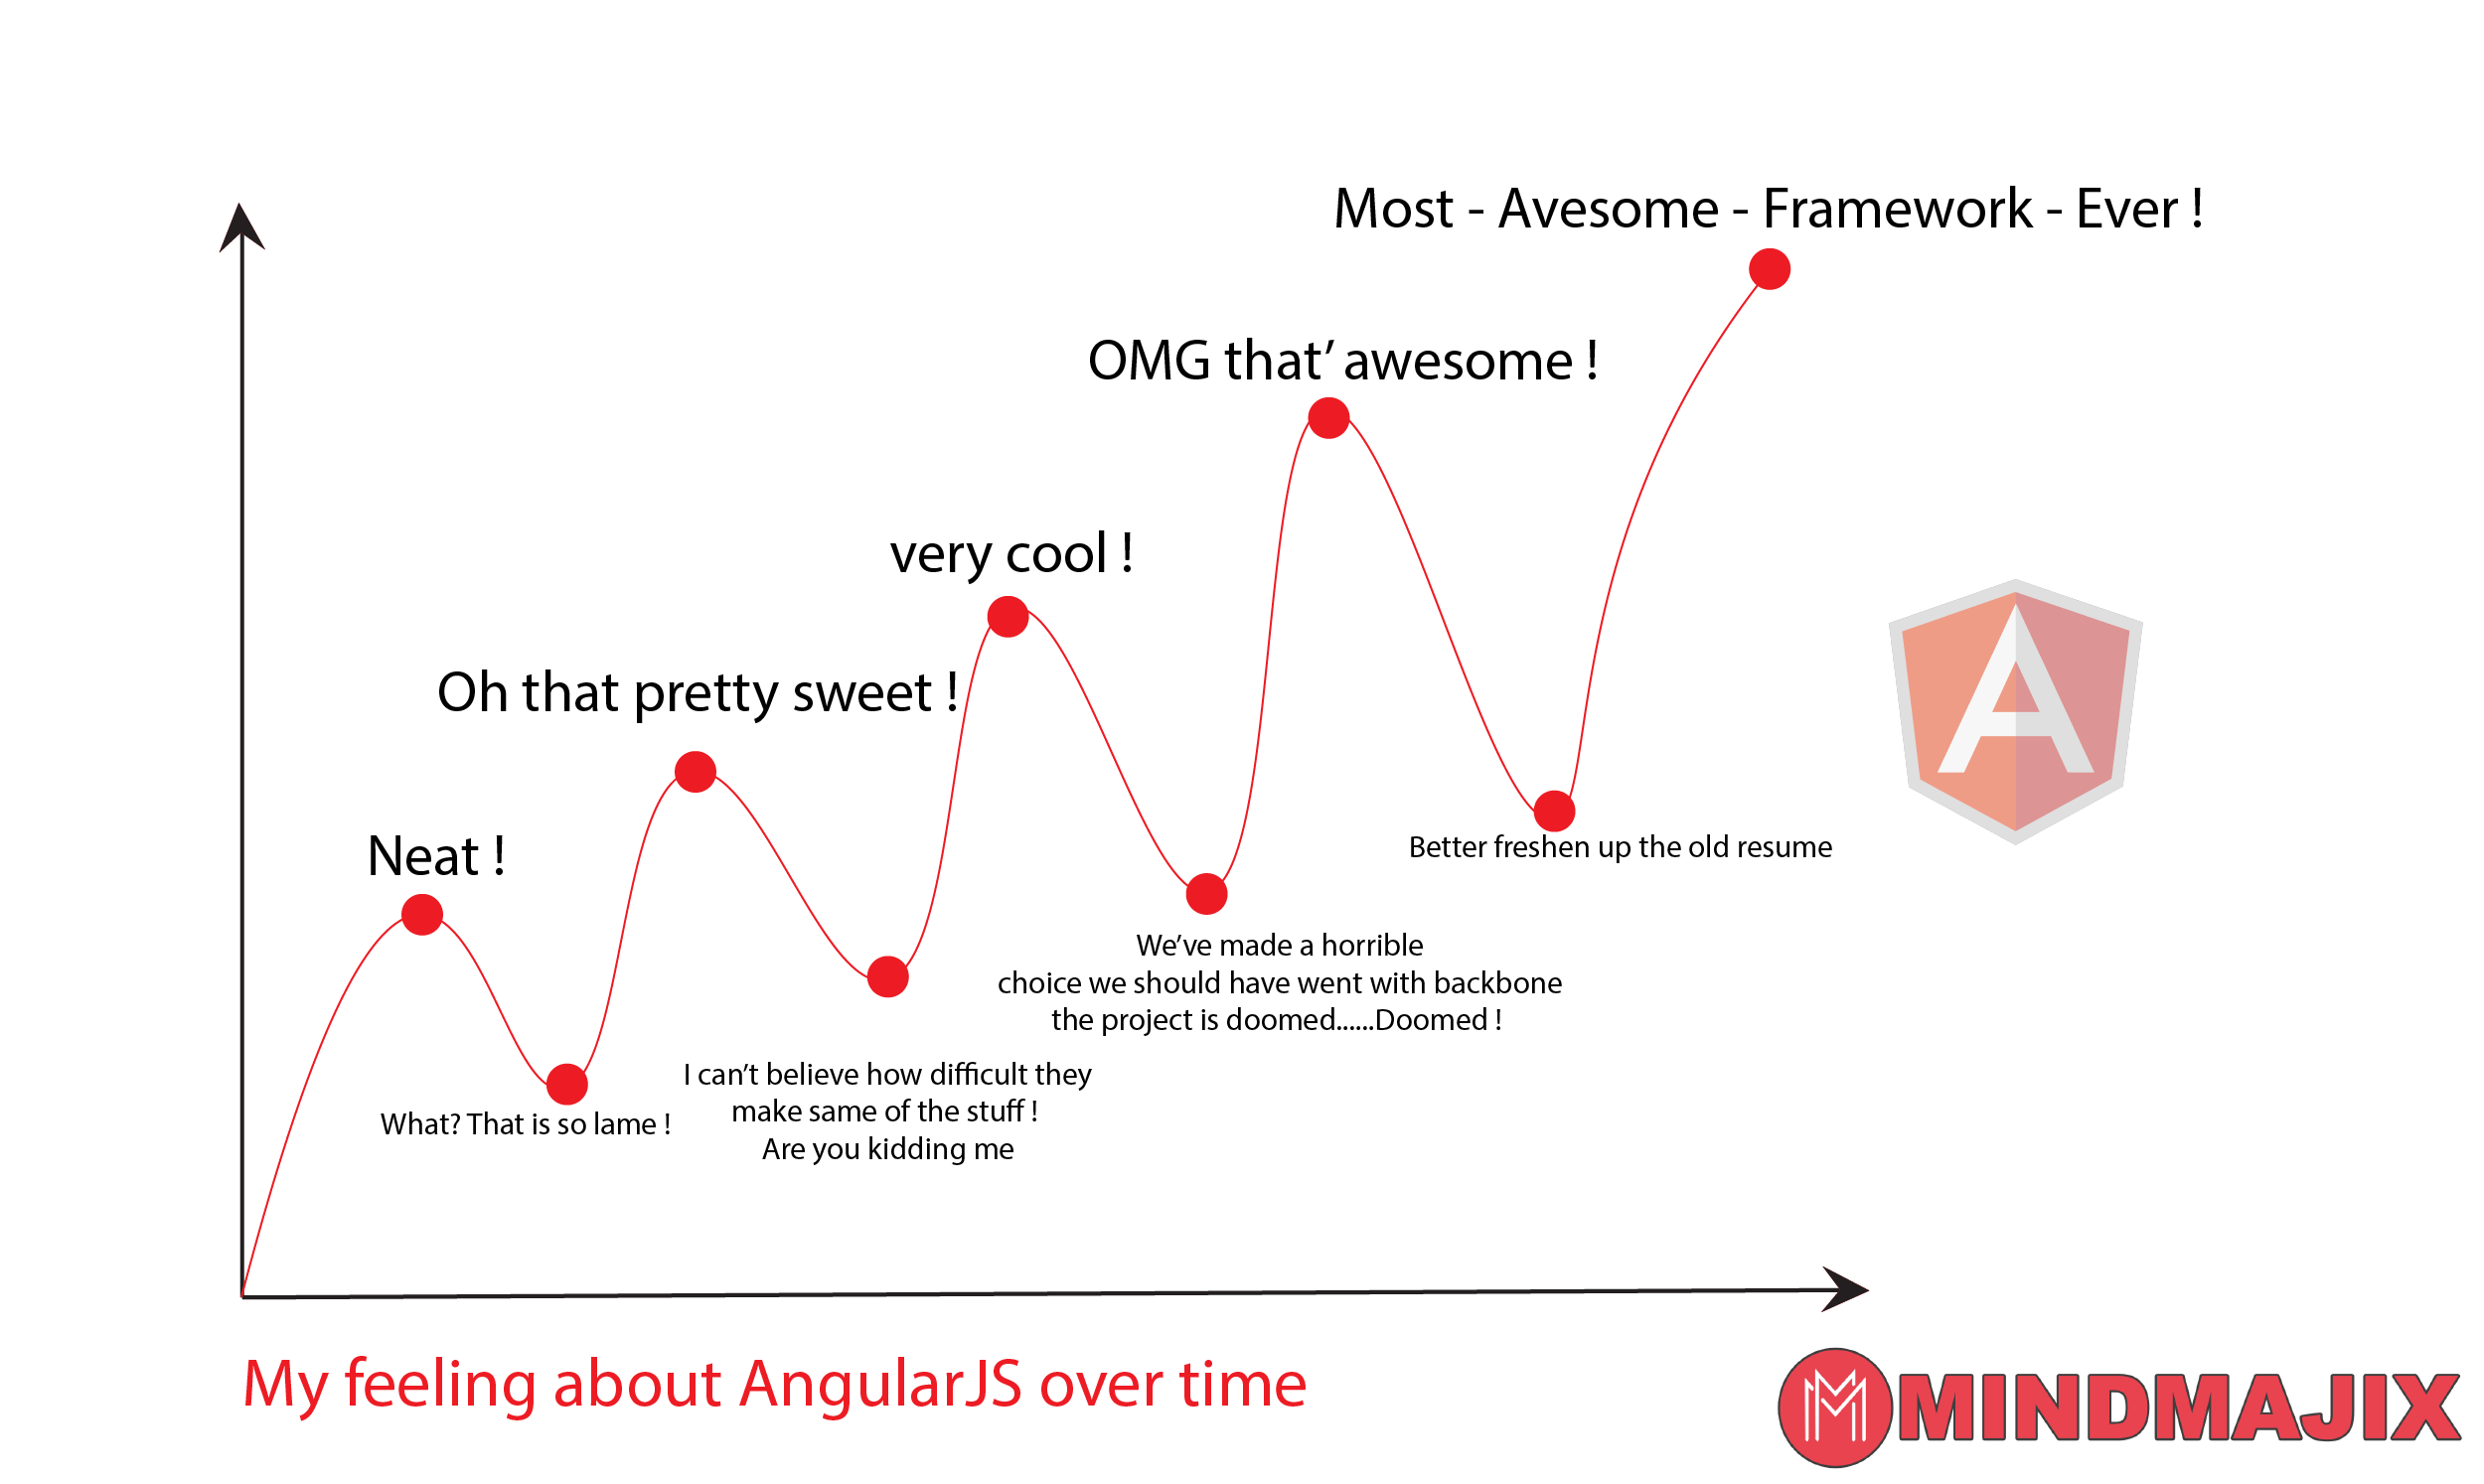 Graphical representation of AngularJS Framework